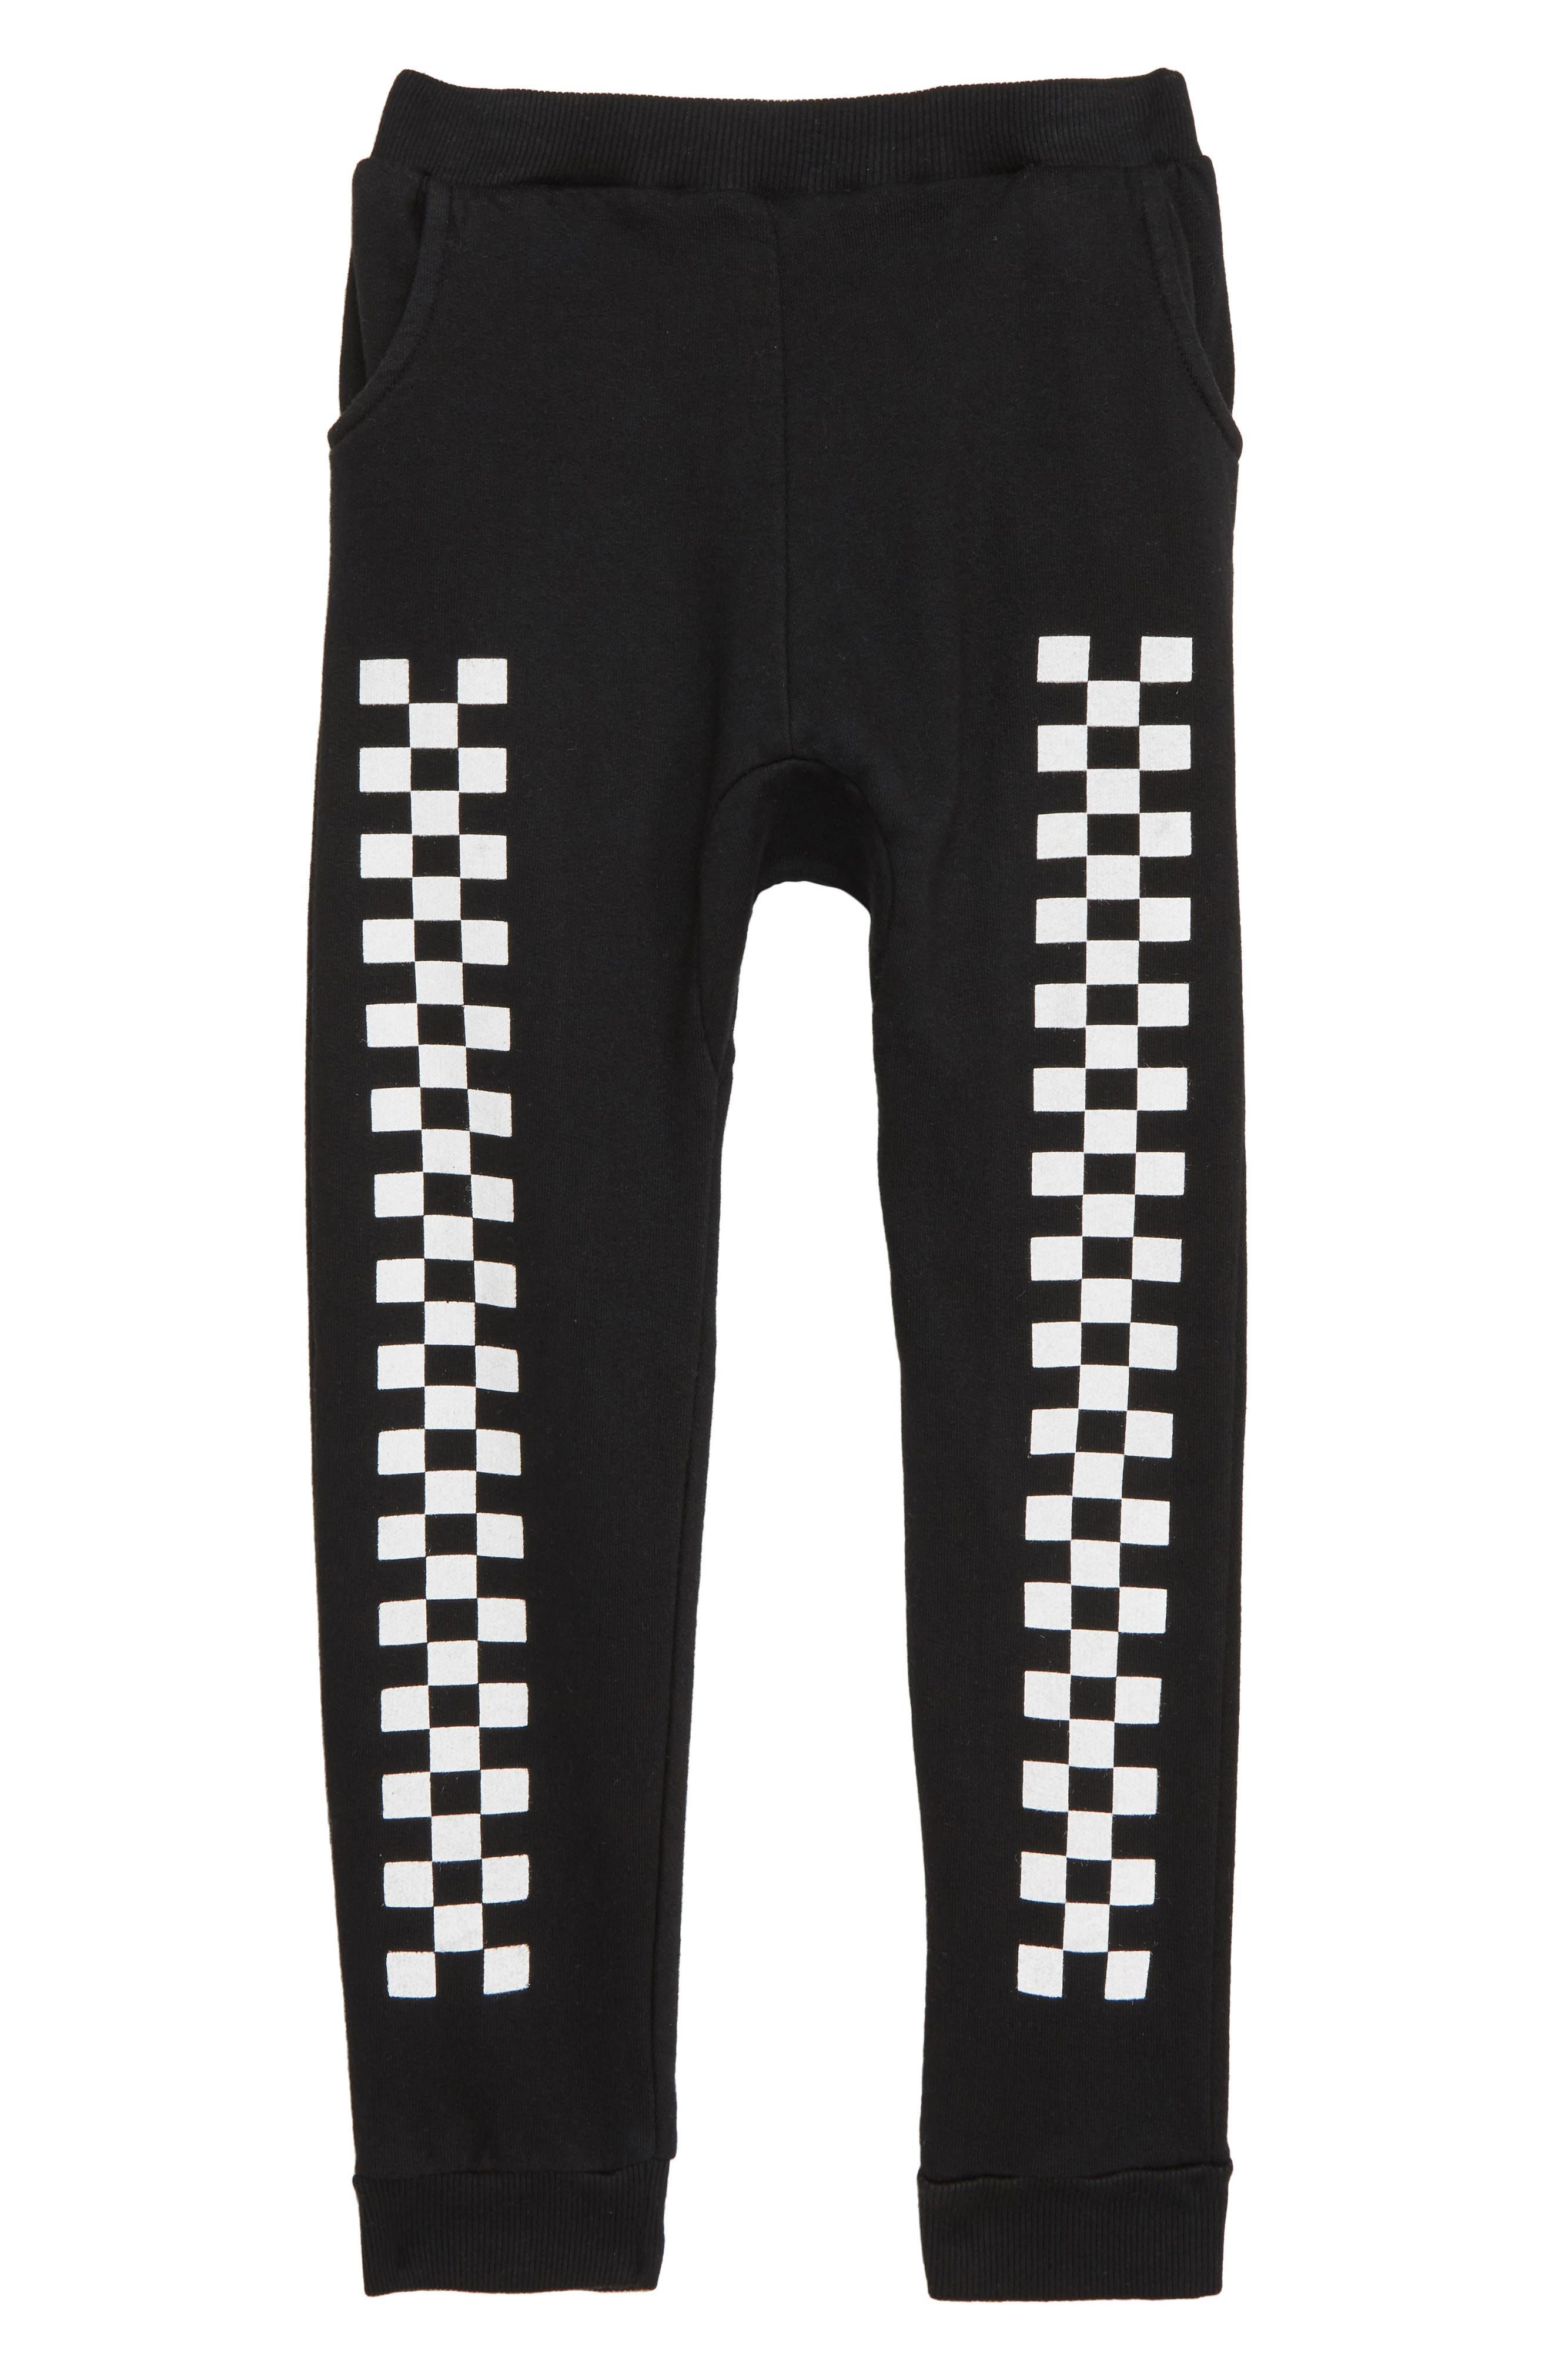 Checker Jogger Pants,                             Main thumbnail 1, color,                             BLACK